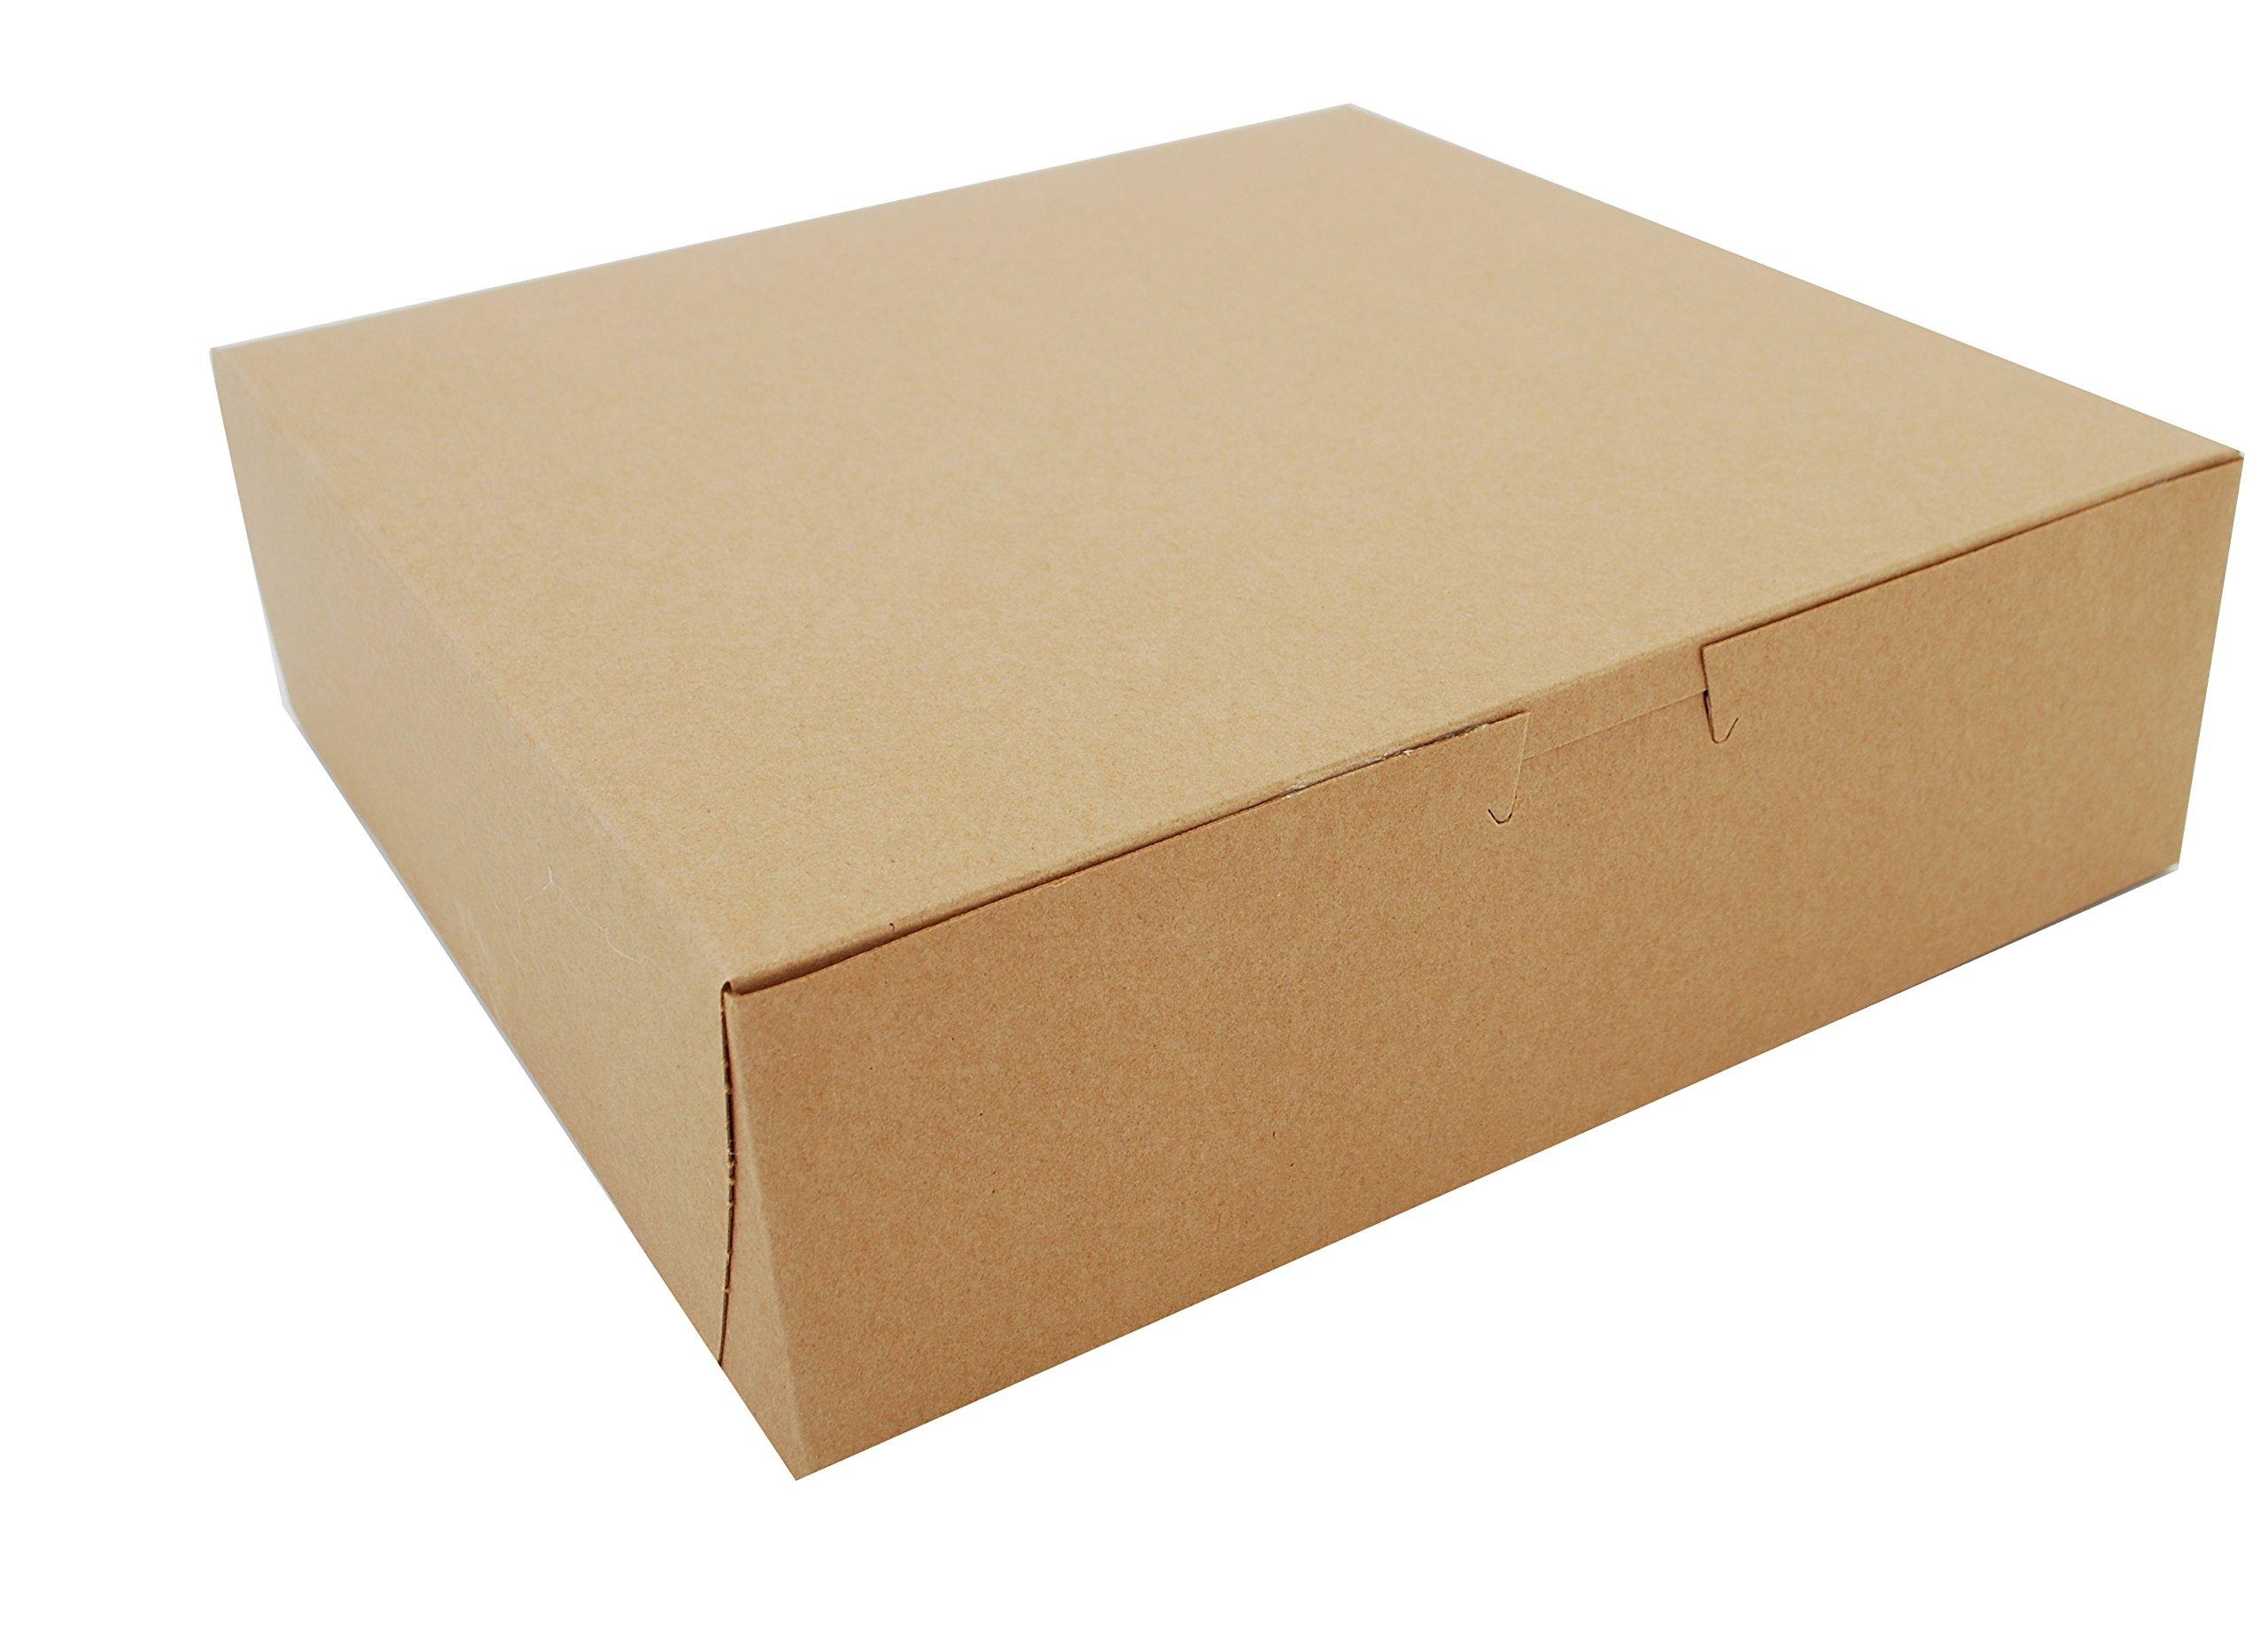 Southern Champion Tray 0971K Kraft Paperboard Non Window Lock Corner Bakery Box, 10'' Length x 10'' Width x 3'' Height (Case of 200)